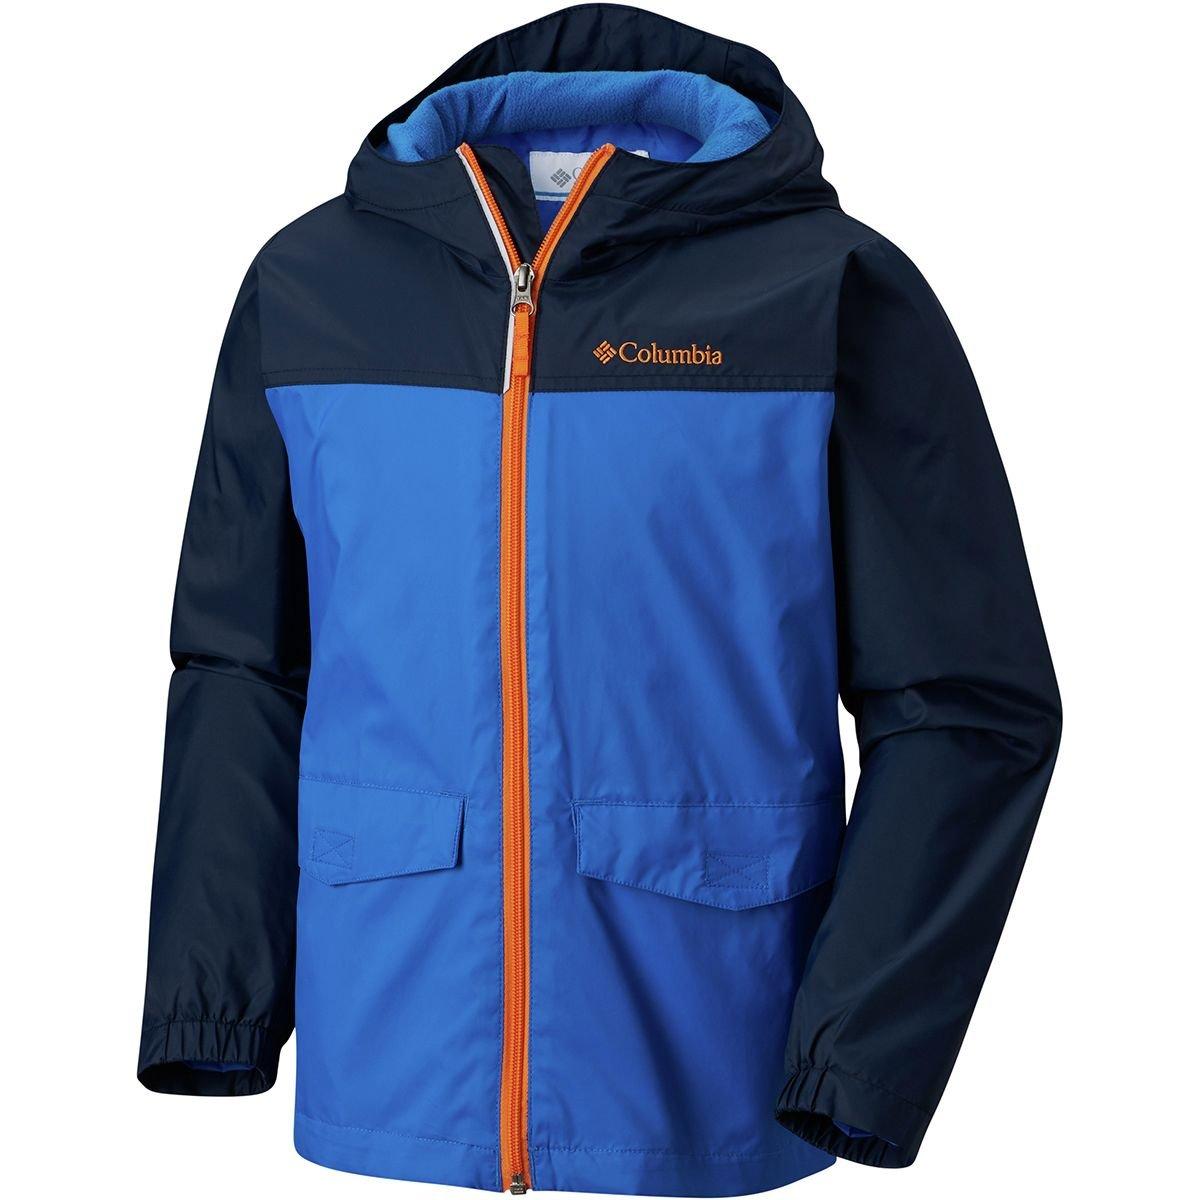 Columbia Big Boys' Rain-Zilla Jacket, Super Blue, Collegiate Navy, Medium